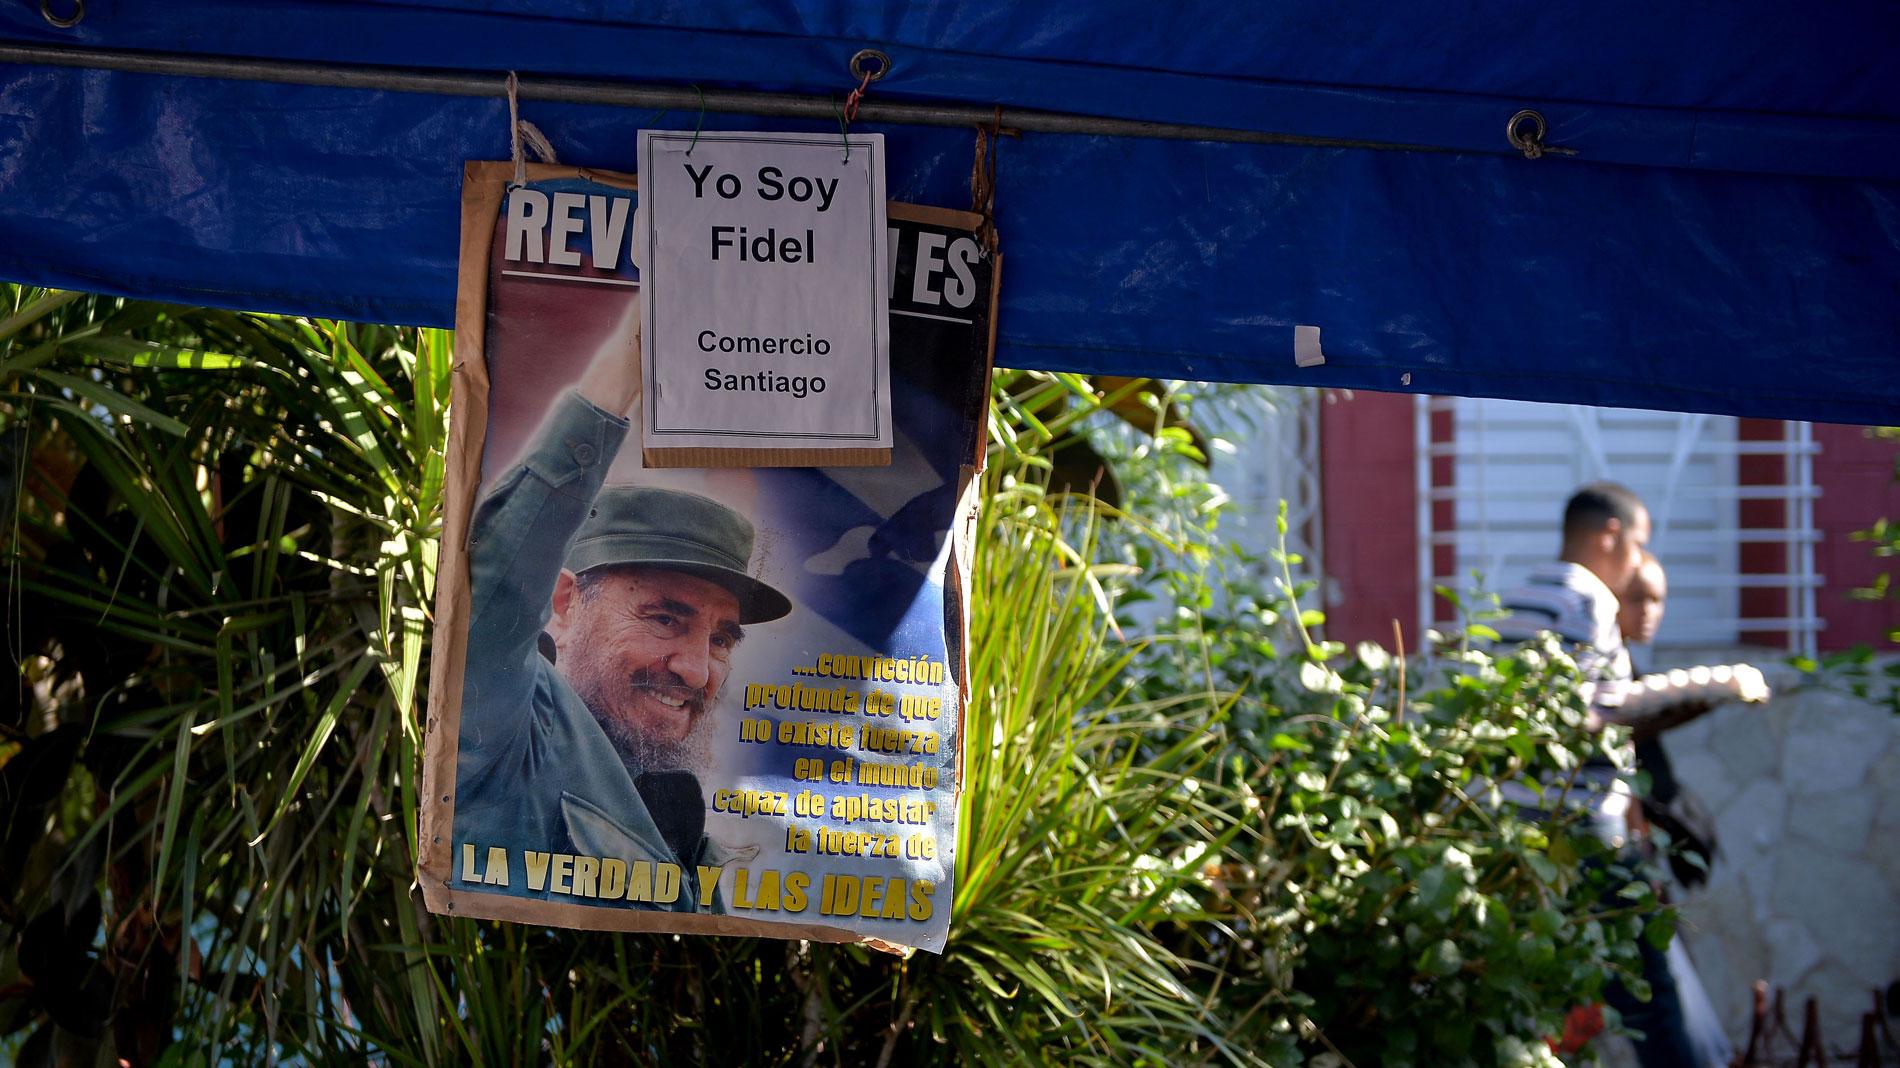 [Comunicado] 60 años de revolución cubana